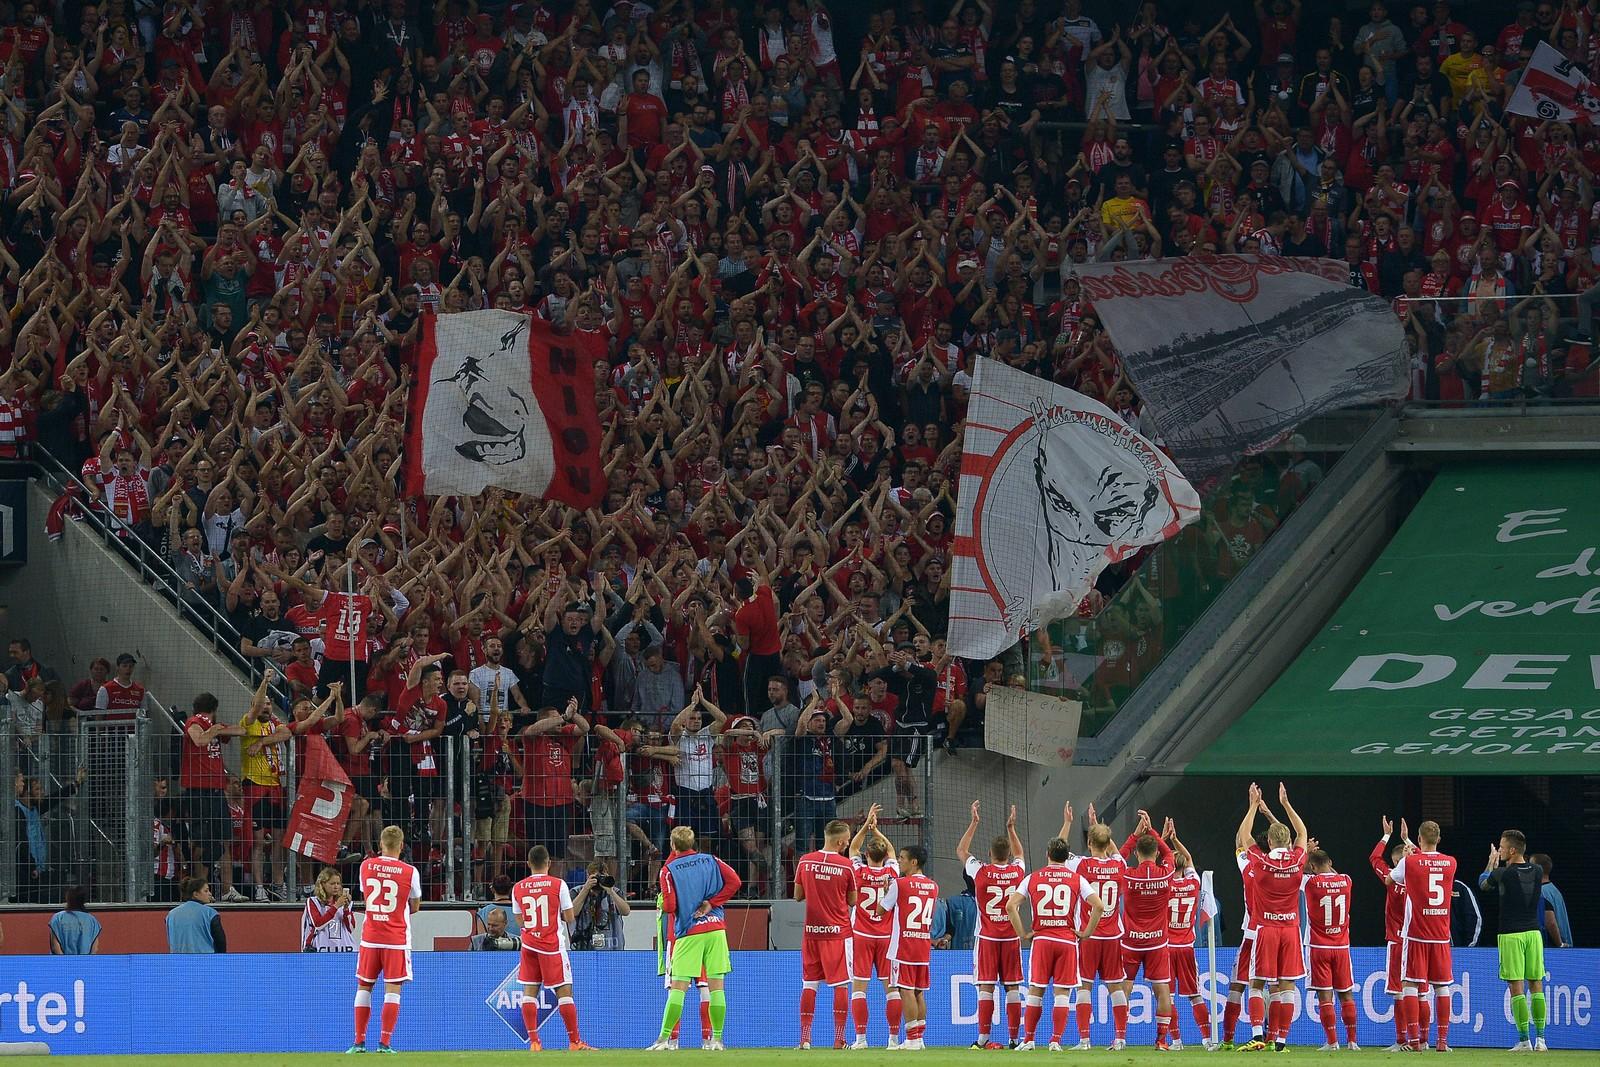 Fans des 1. FC Union Berlin beim Spiel gegen den 1. FC Köln